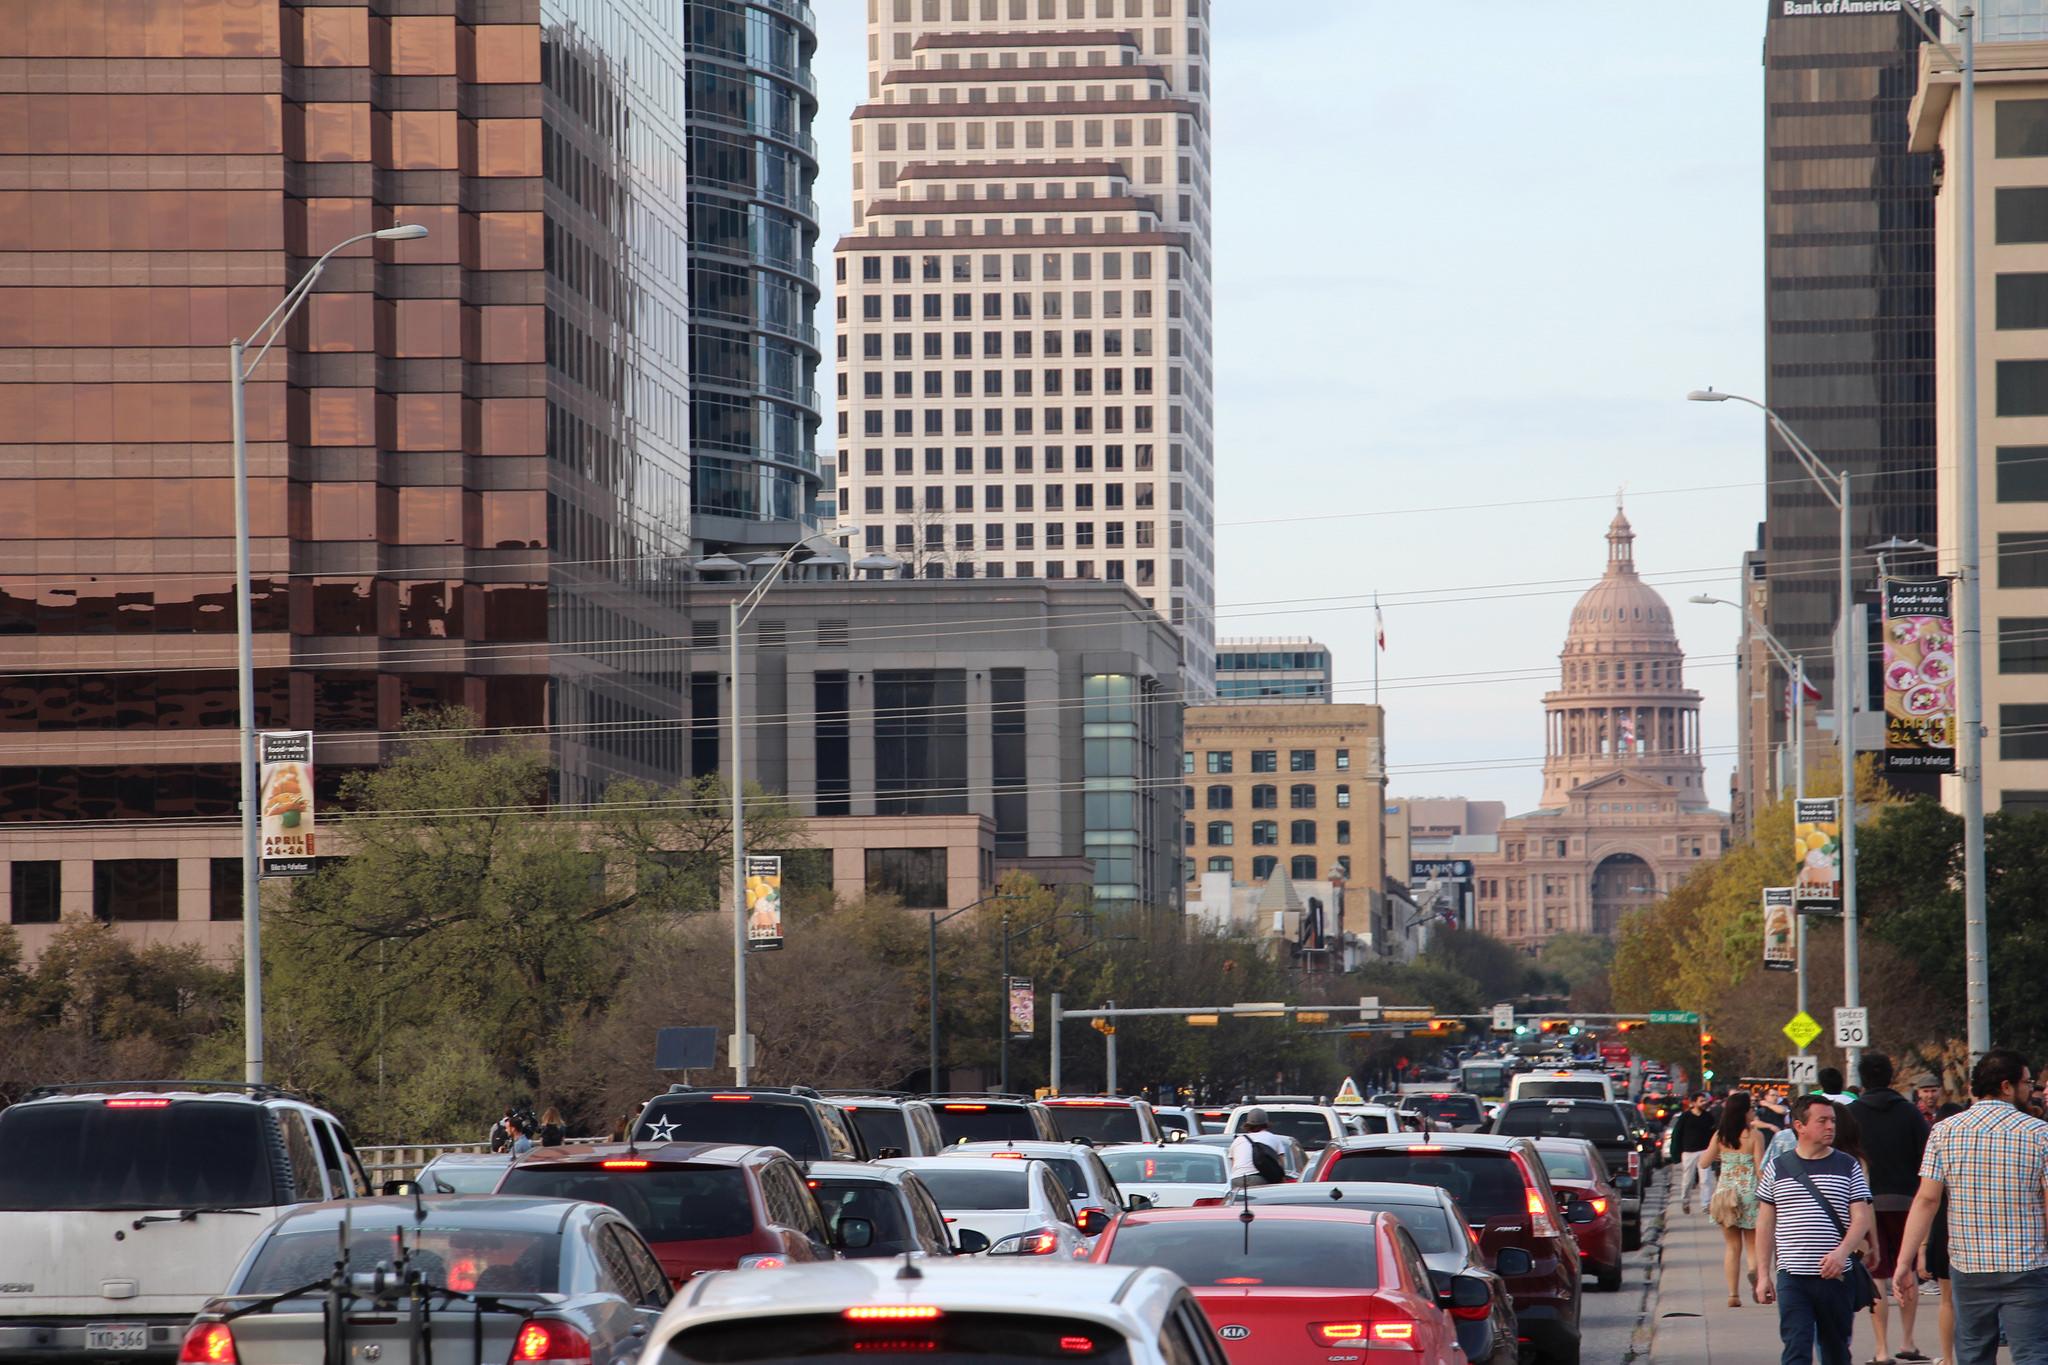 Traffic along Congress Avenue in Austin Texas.